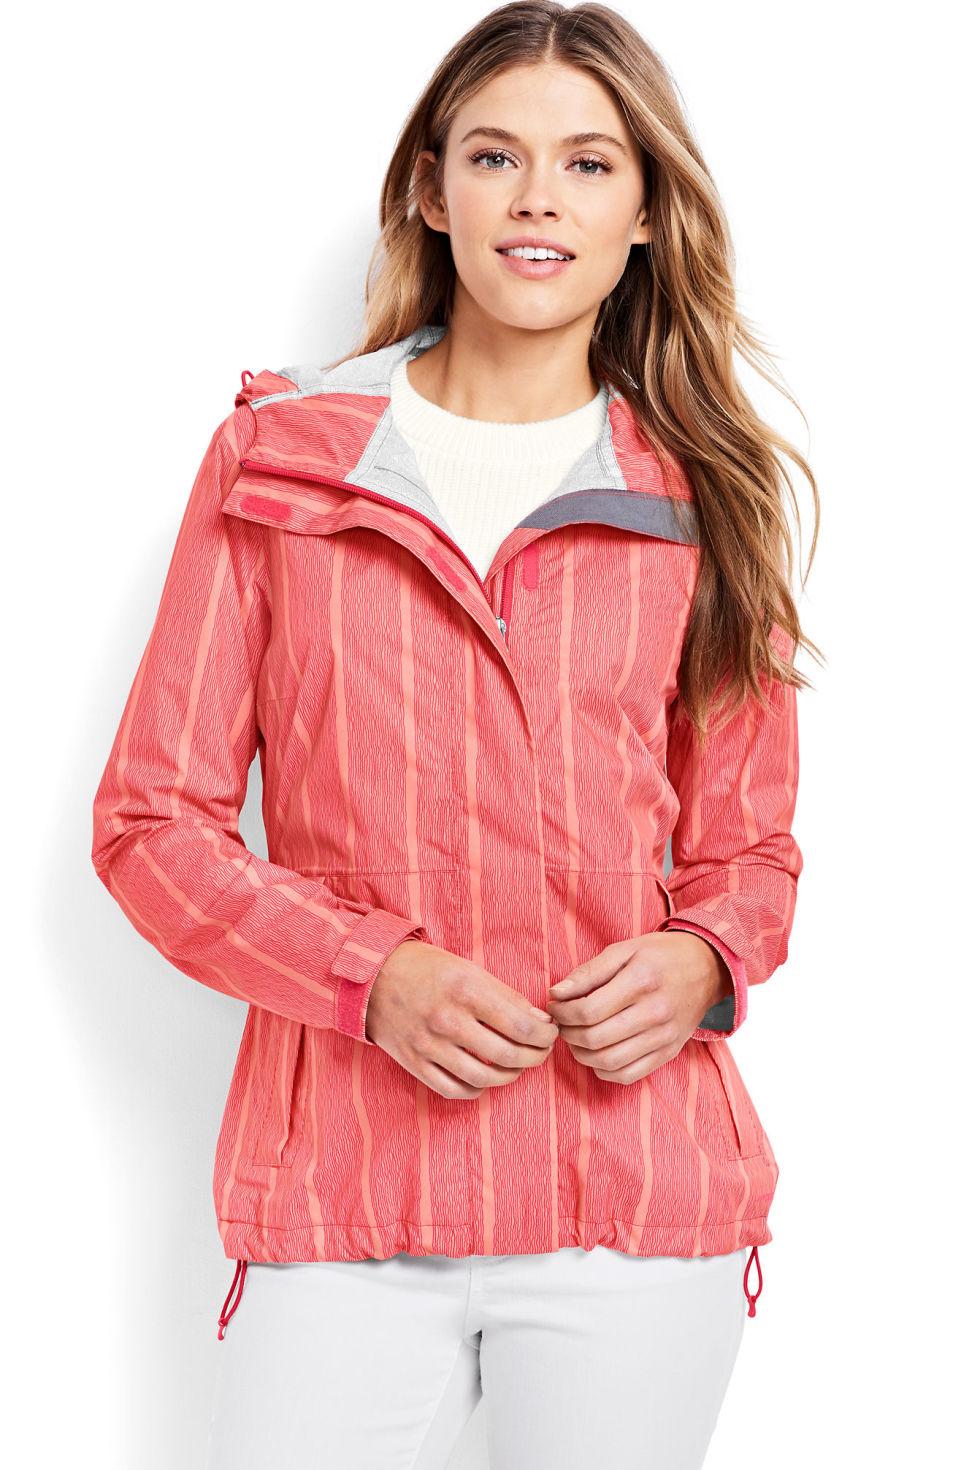 15 cute spring raincoats - best raincoats for women MSJQPUP